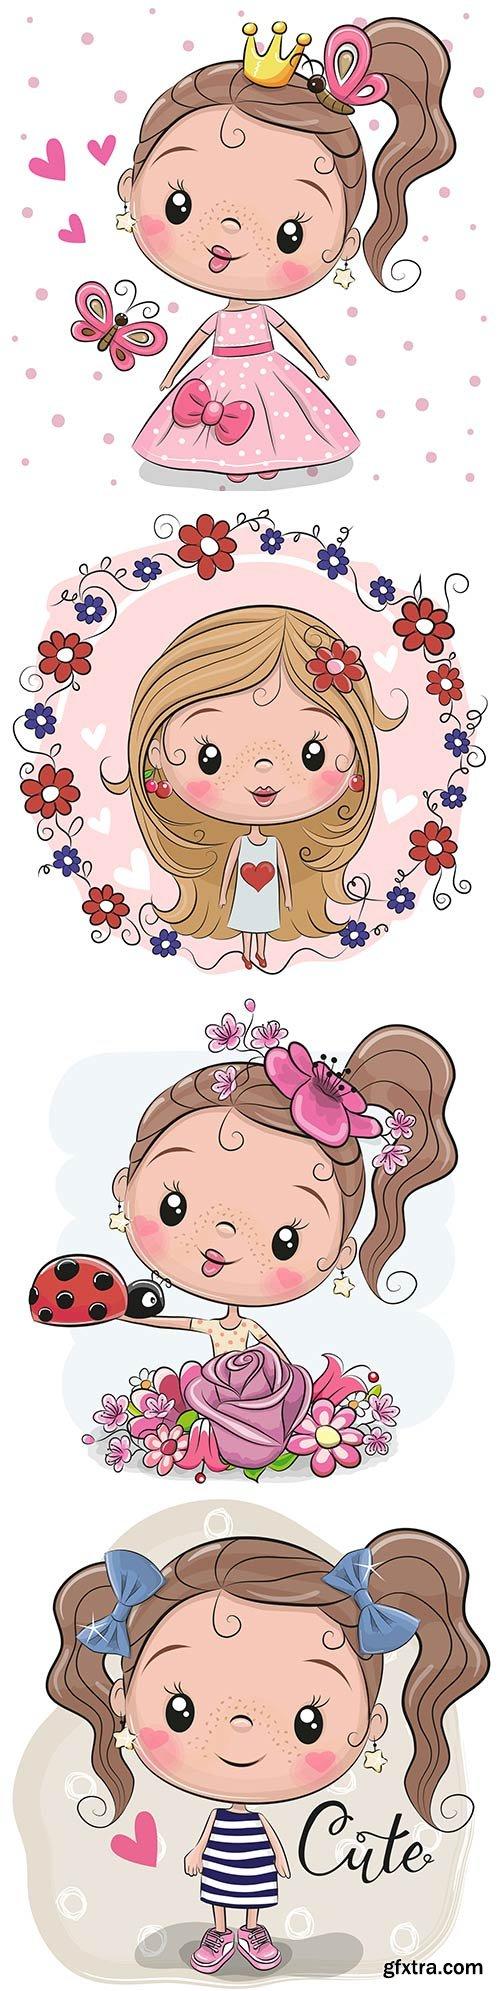 Cute girls in vector